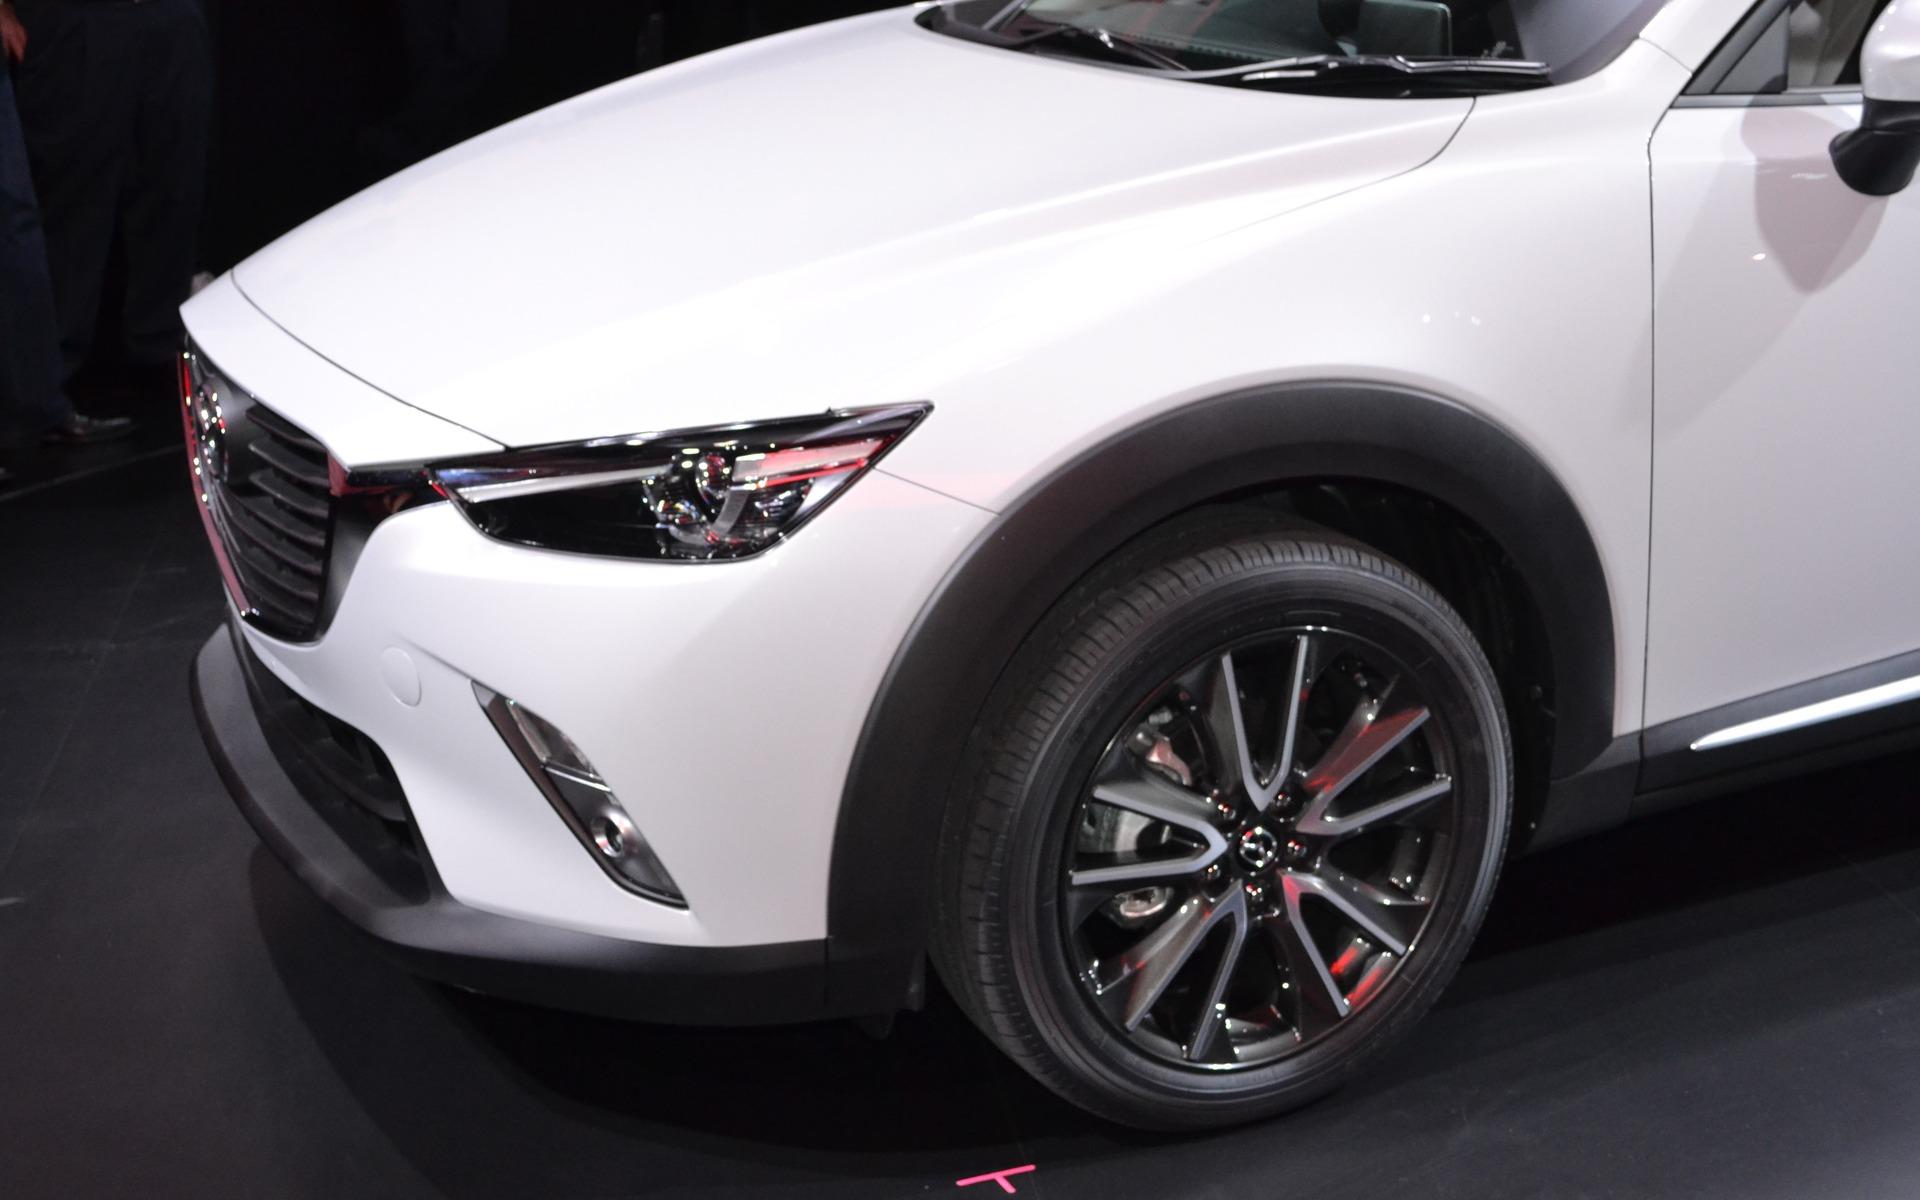 https://i.gaw.to/photos/1/7/7/177653_2016_Mazda_CX-3.jpg